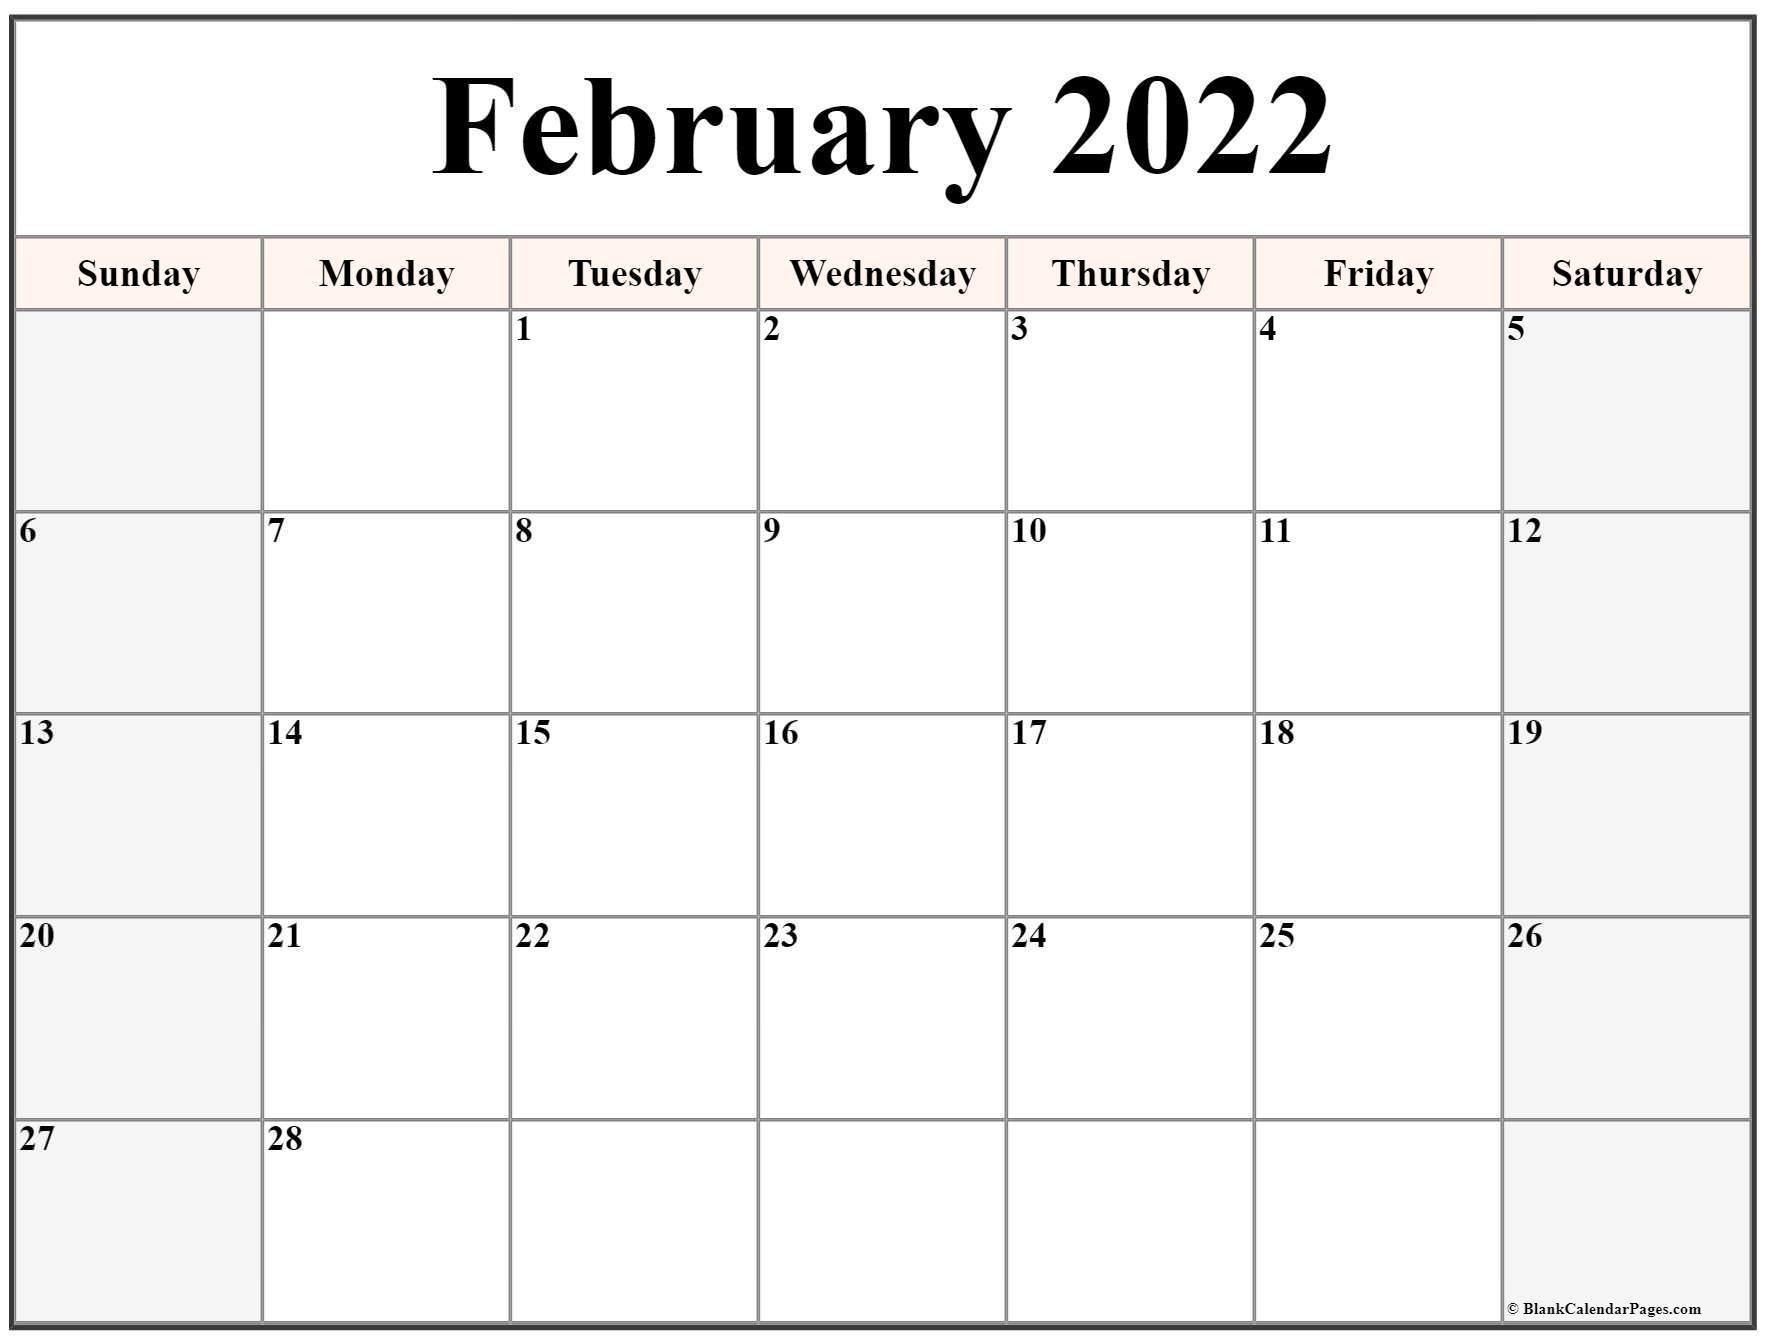 February 2022 Calendar | Free Printable Calendar Templates Within Blank Calendar April 2022 Printable February